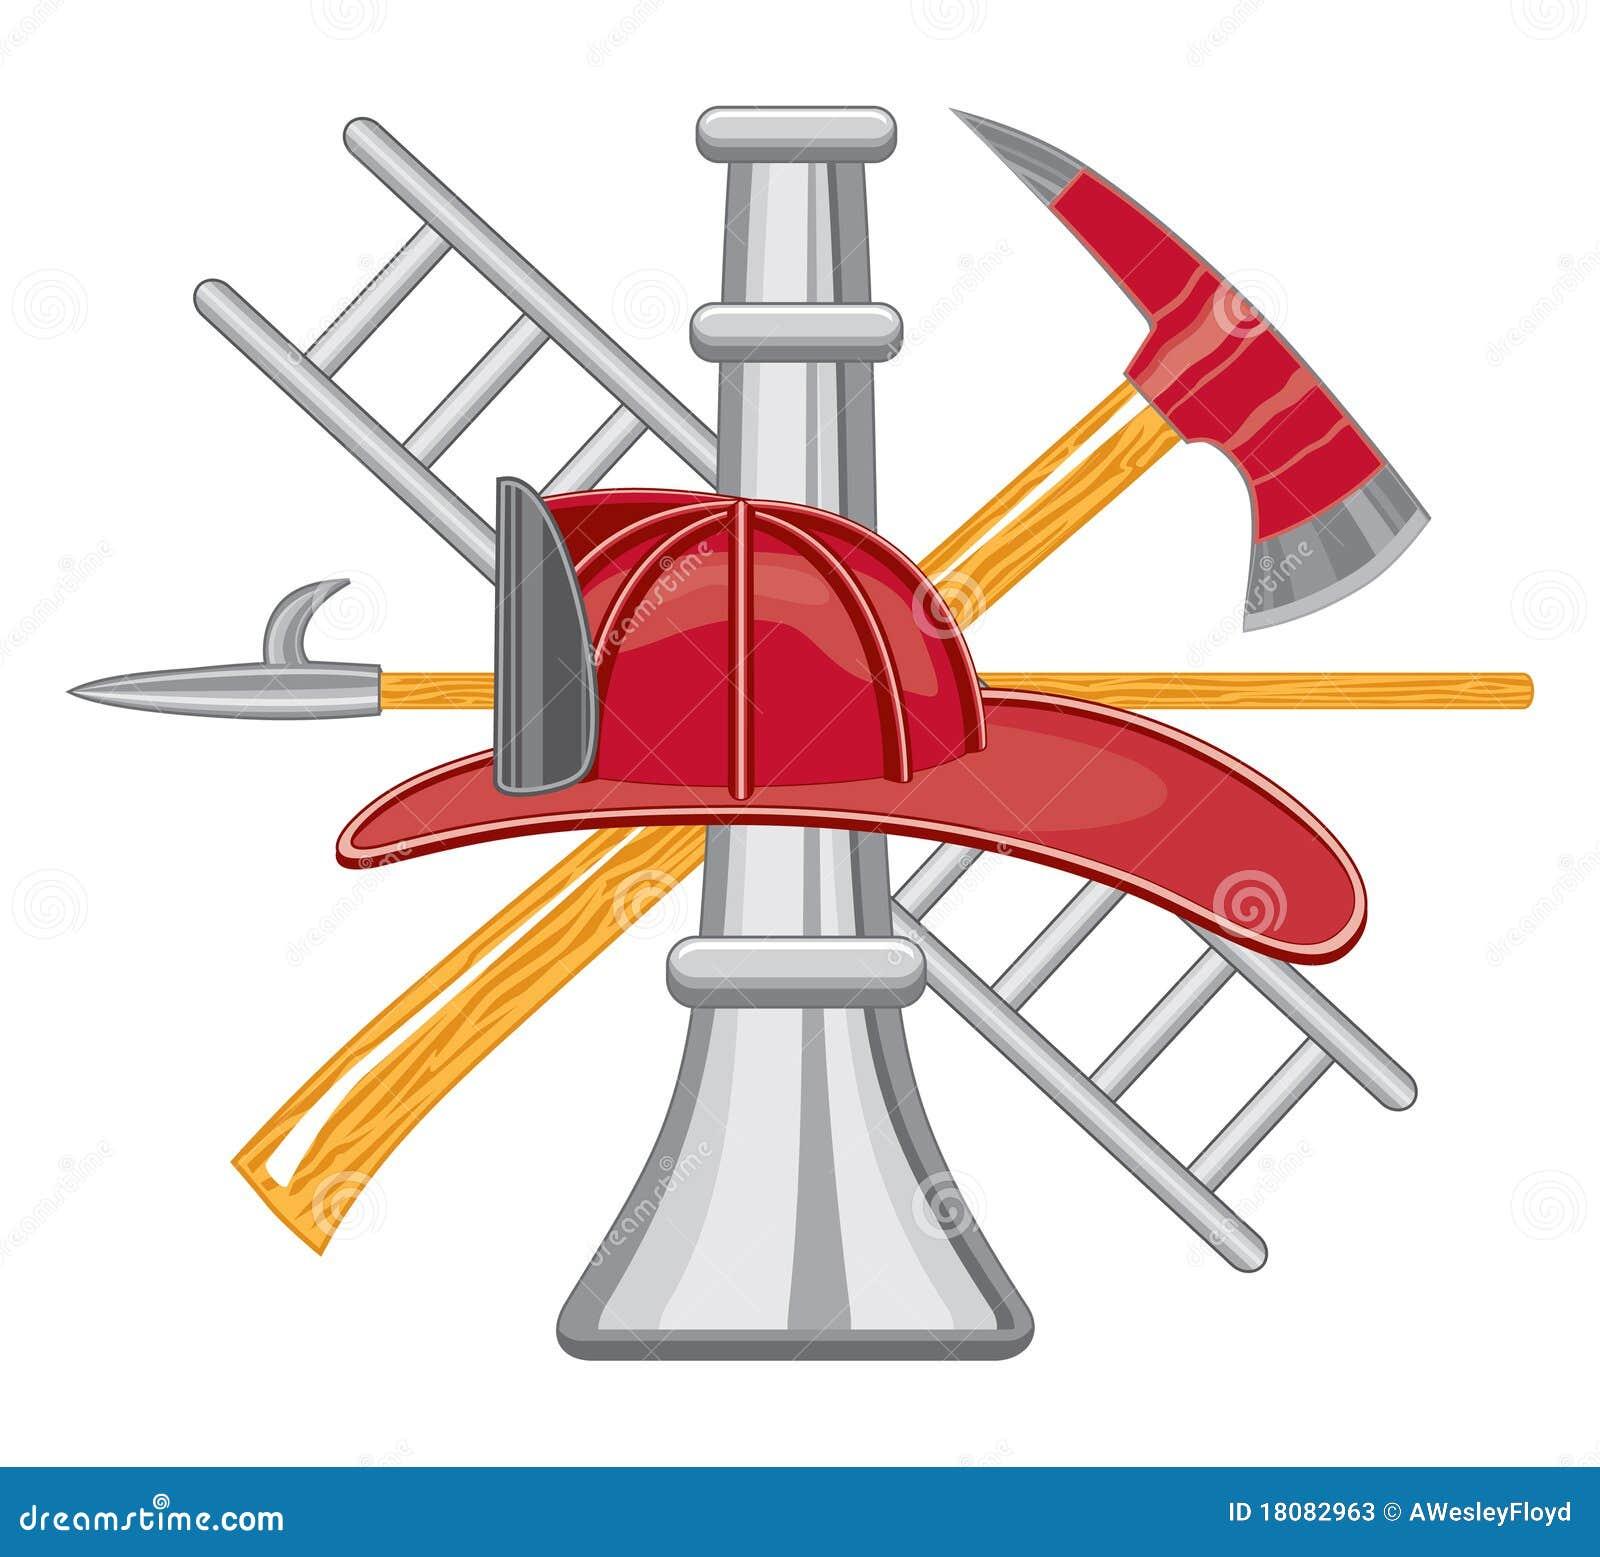 Firefighter Tools Logo Stock Photos